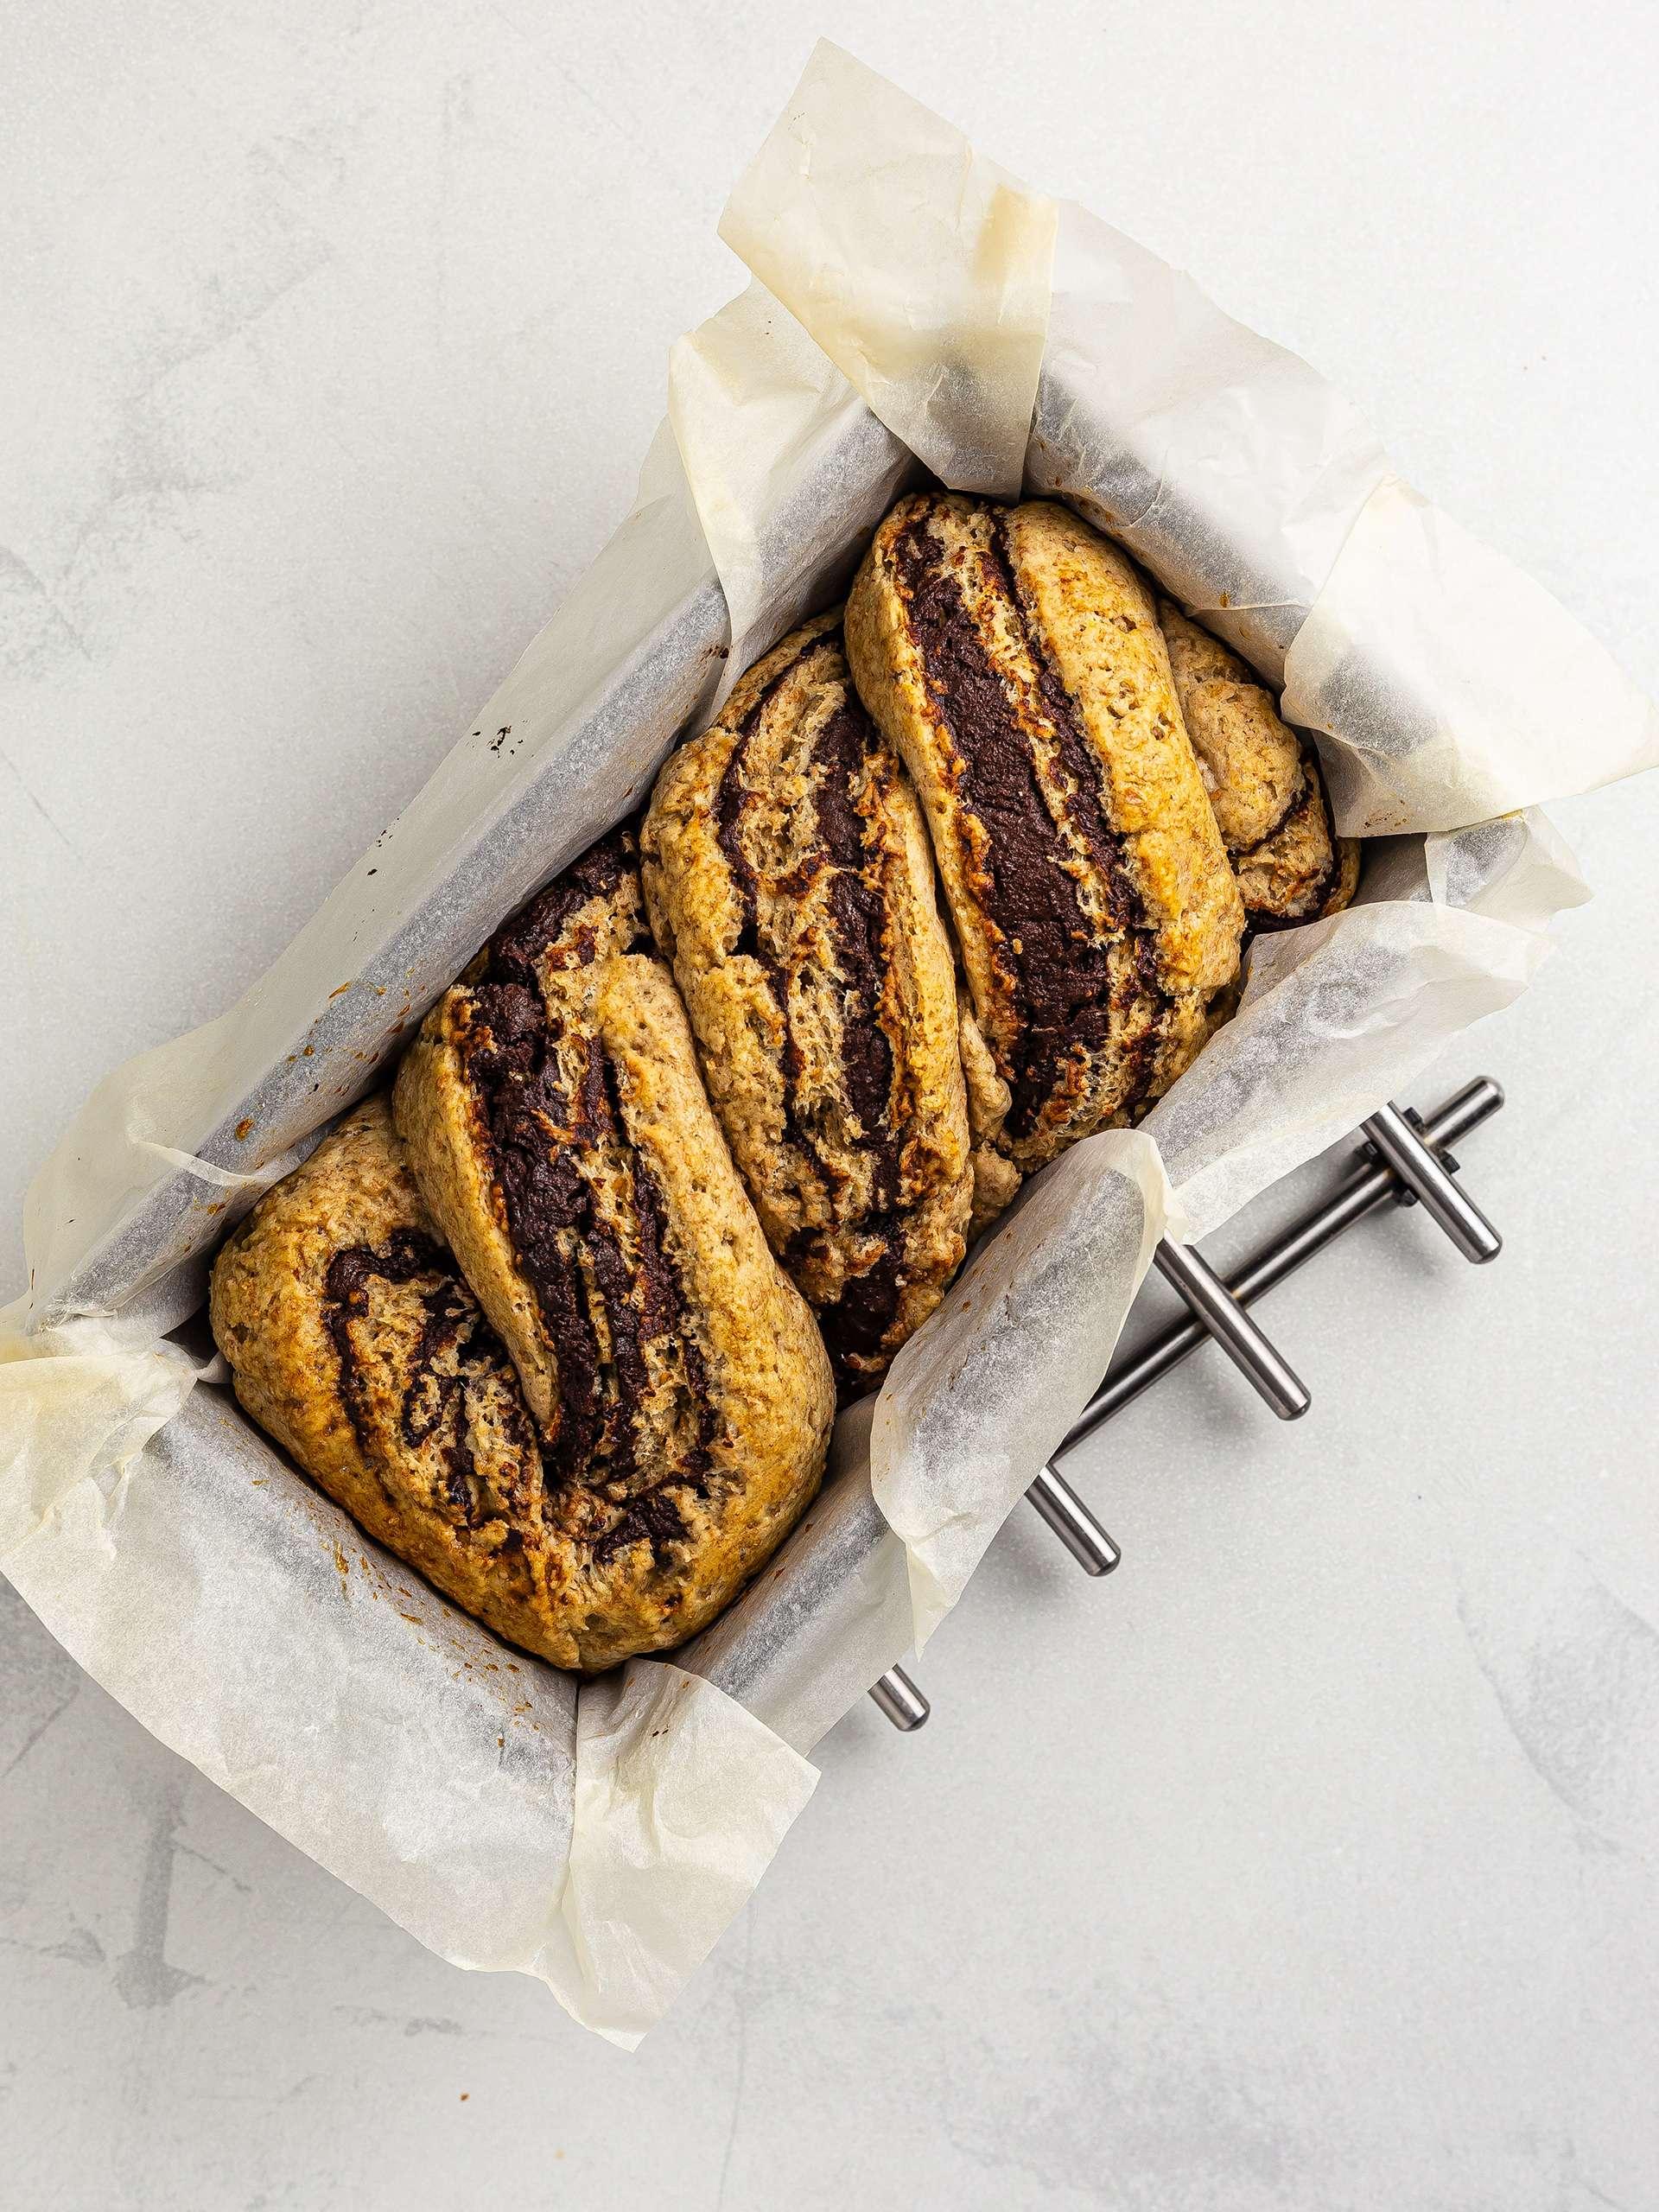 baked chocolate krantz cake